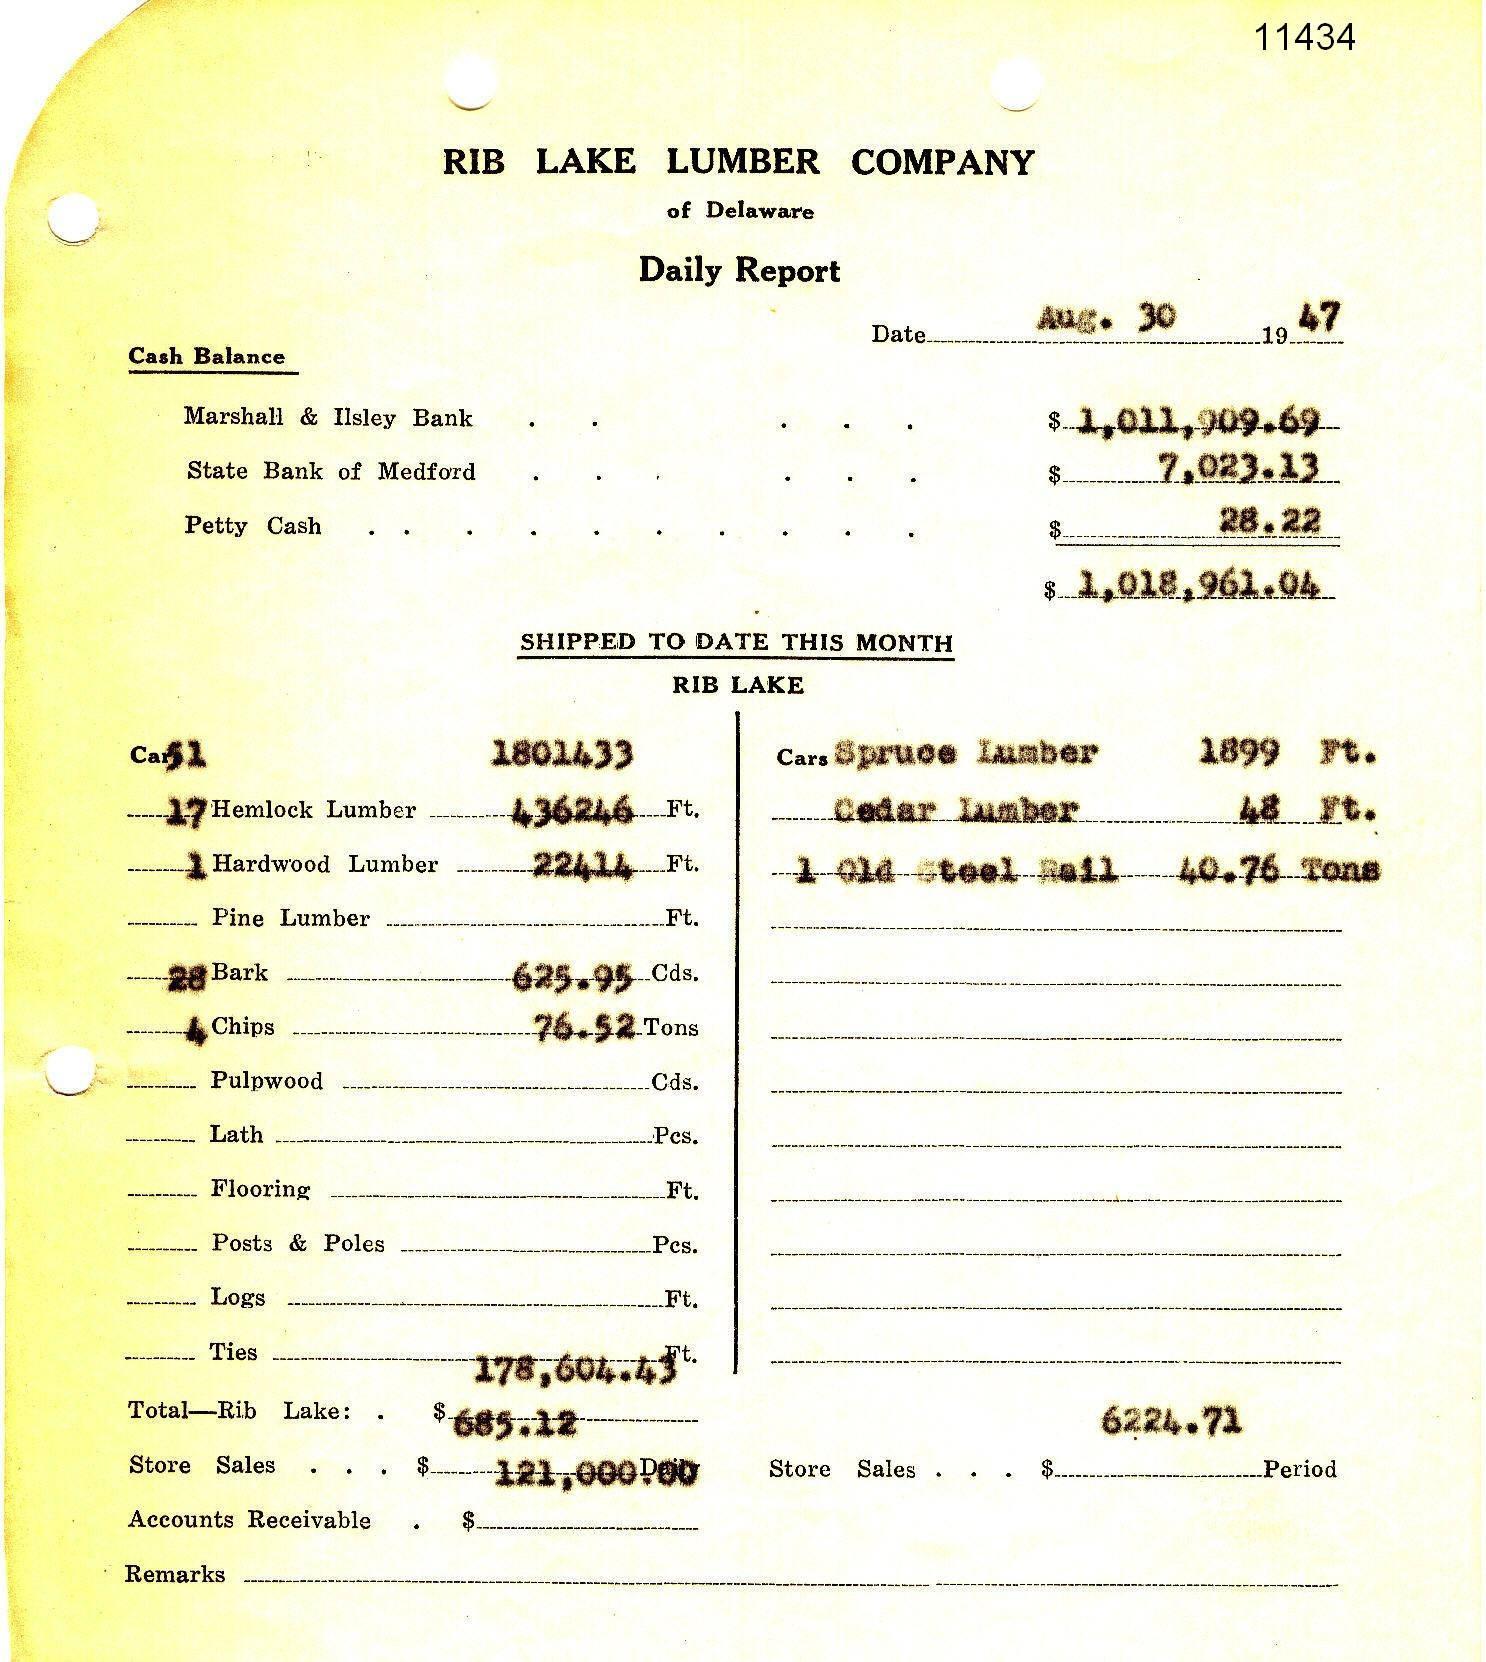 C:\Users\Robert P. Rusch\Desktop\II. RLHSoc\Documents & Photos-Scanned\Rib Lake History 11400-11499\11434-RLLC Daily Report 8-30-1947, NB_ bark sales 625.95 cords.jpg